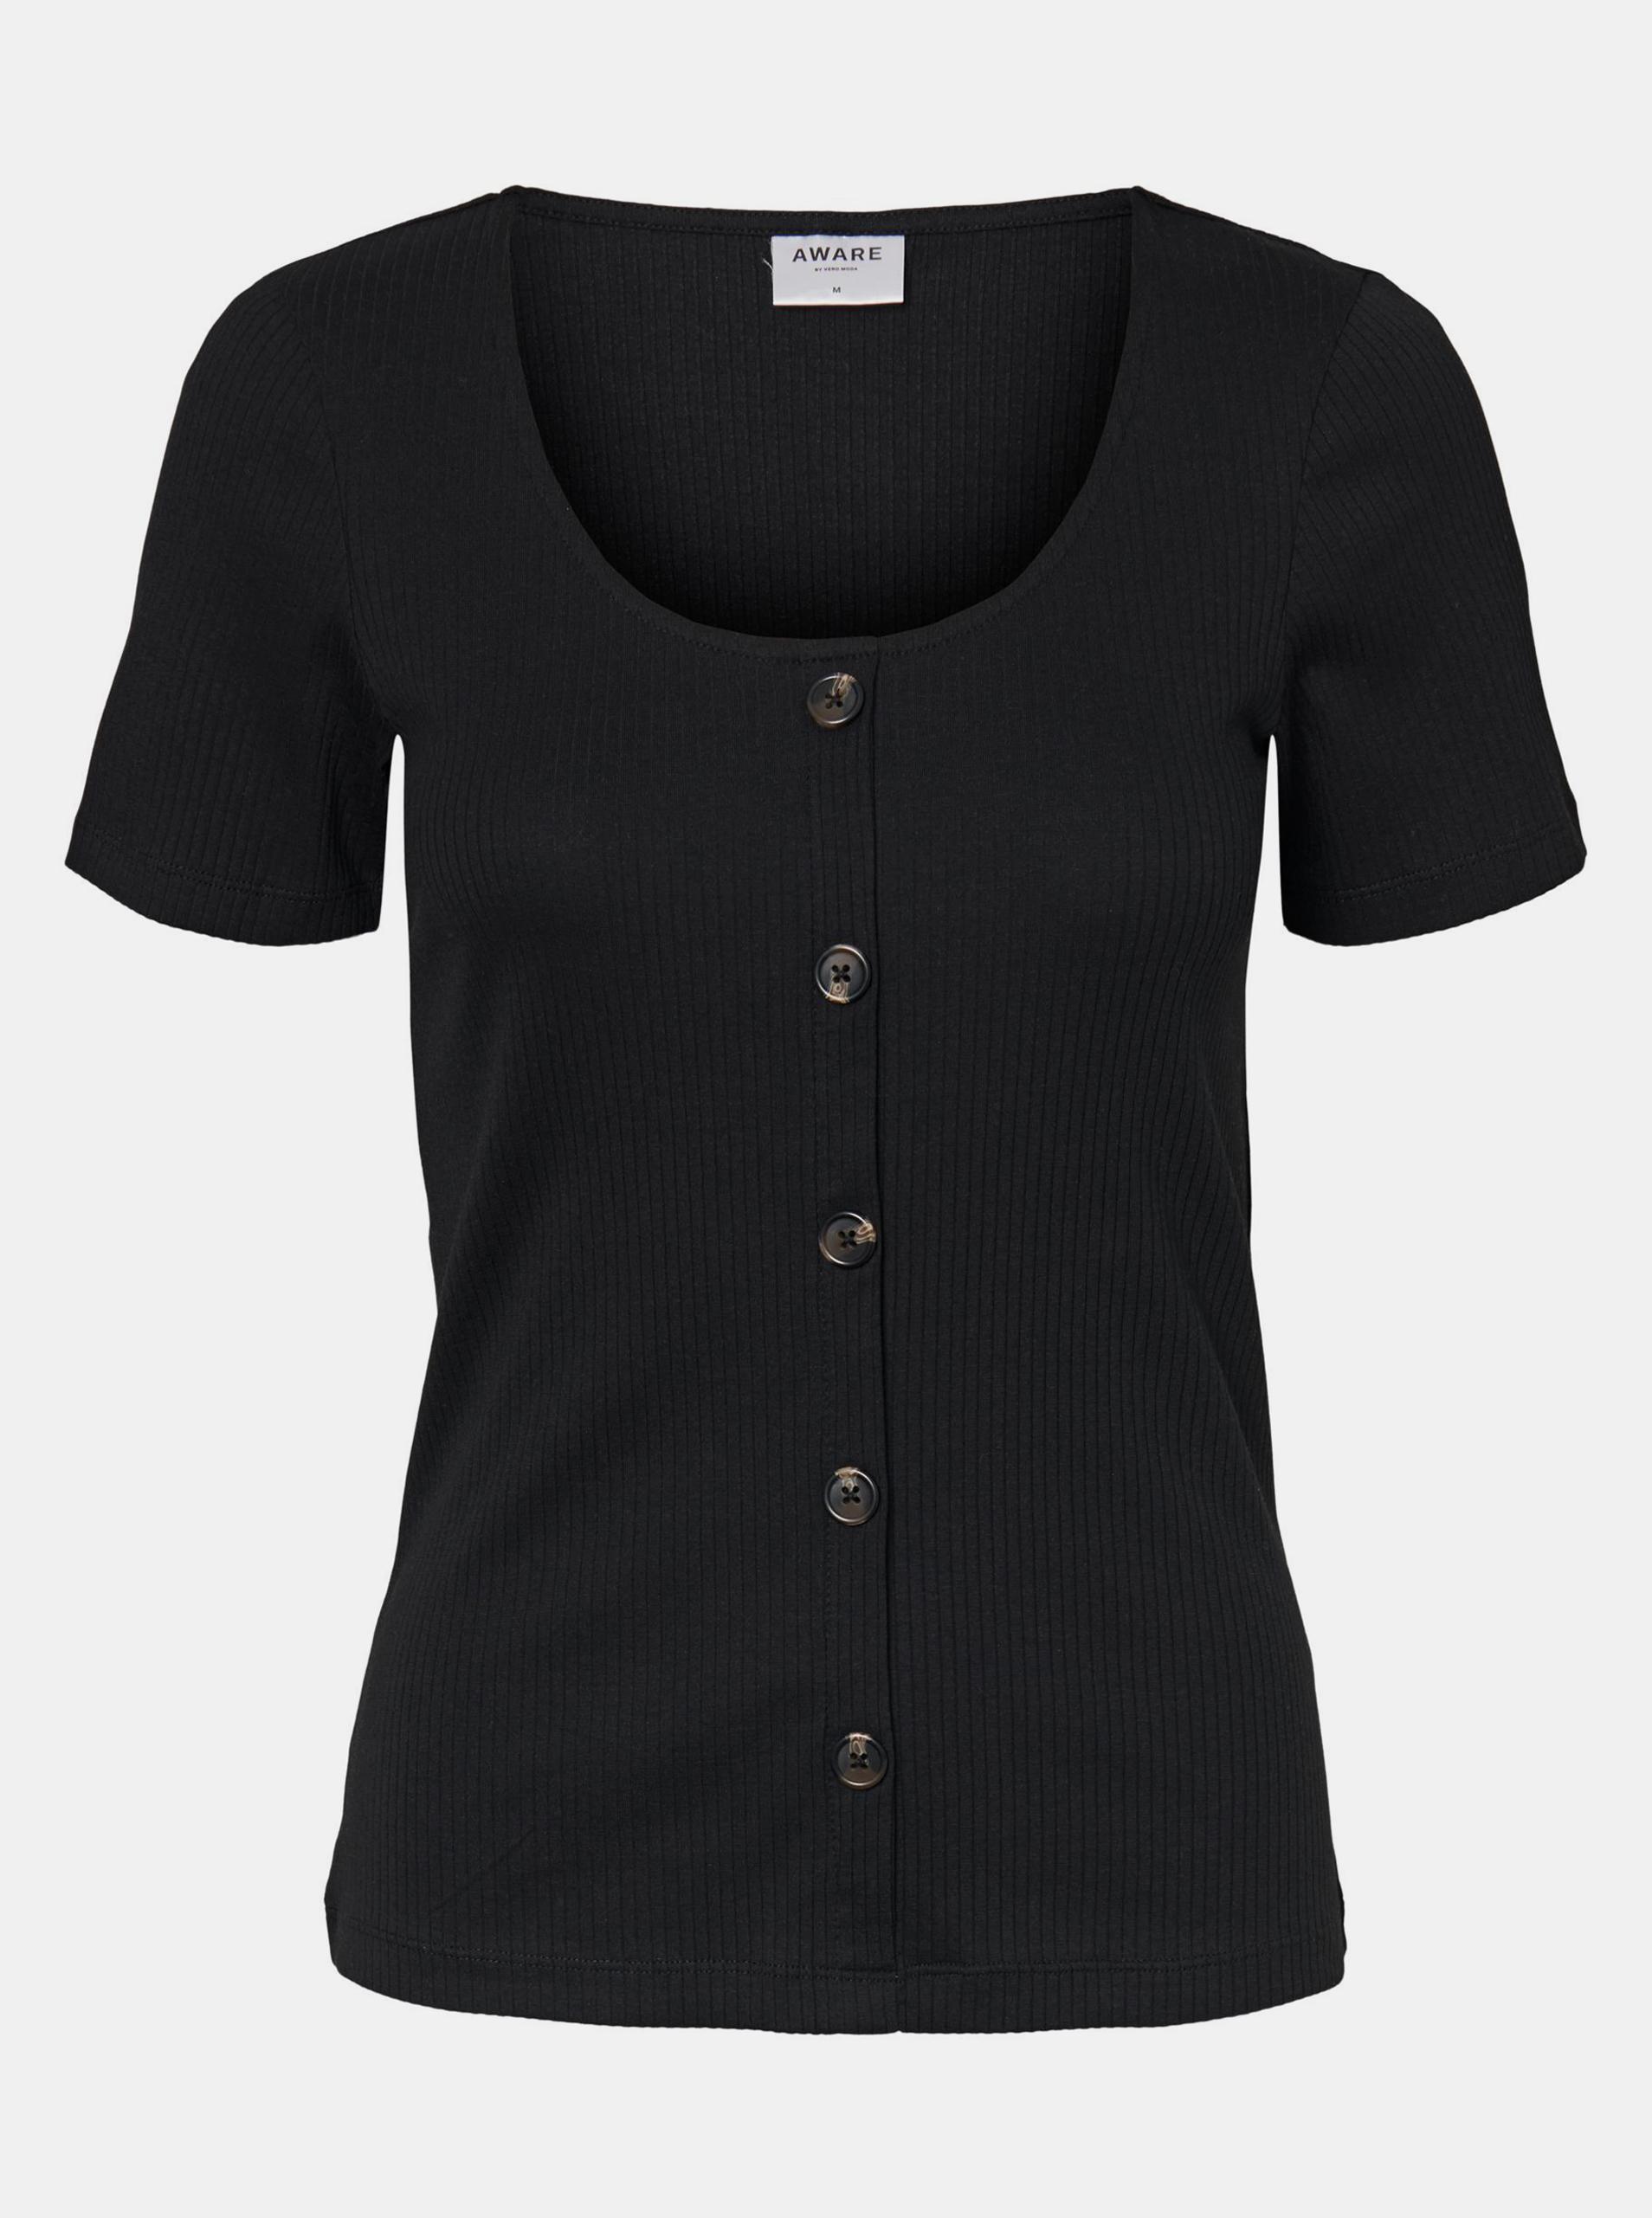 Vero Moda negre tricou Helsinki